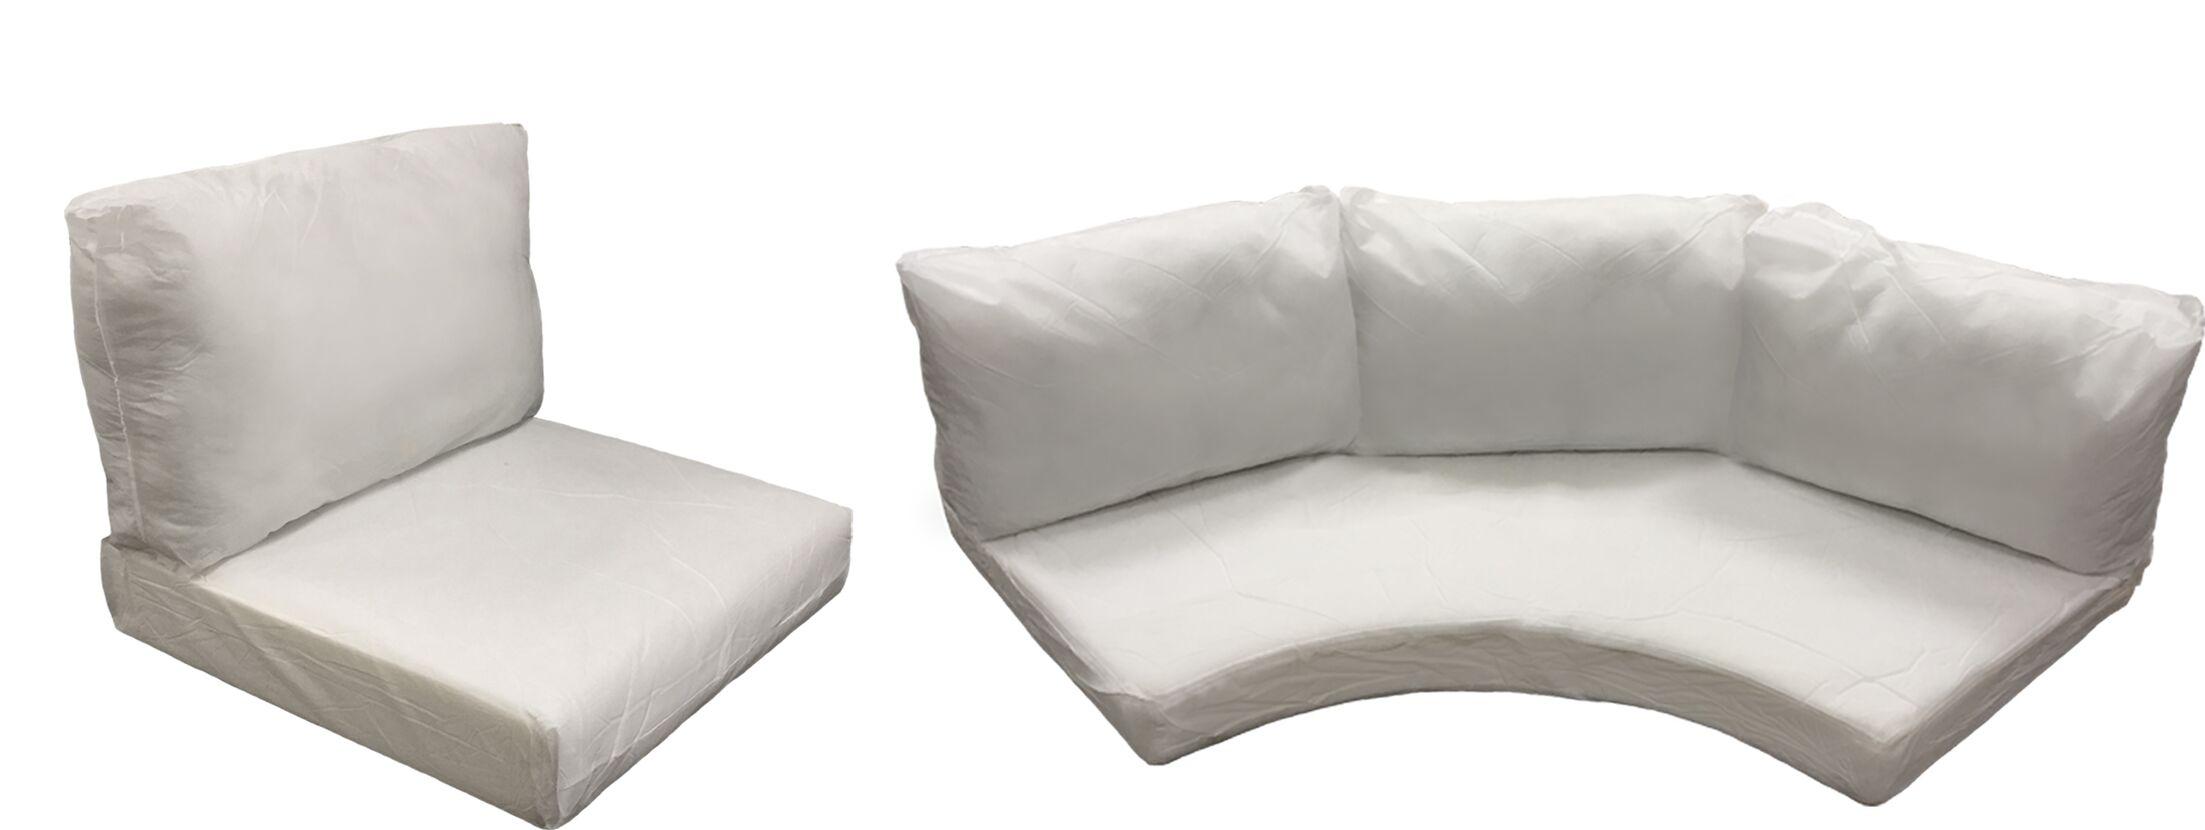 East Village Outdoor 10 Piece Lounge Chair Cushion Set